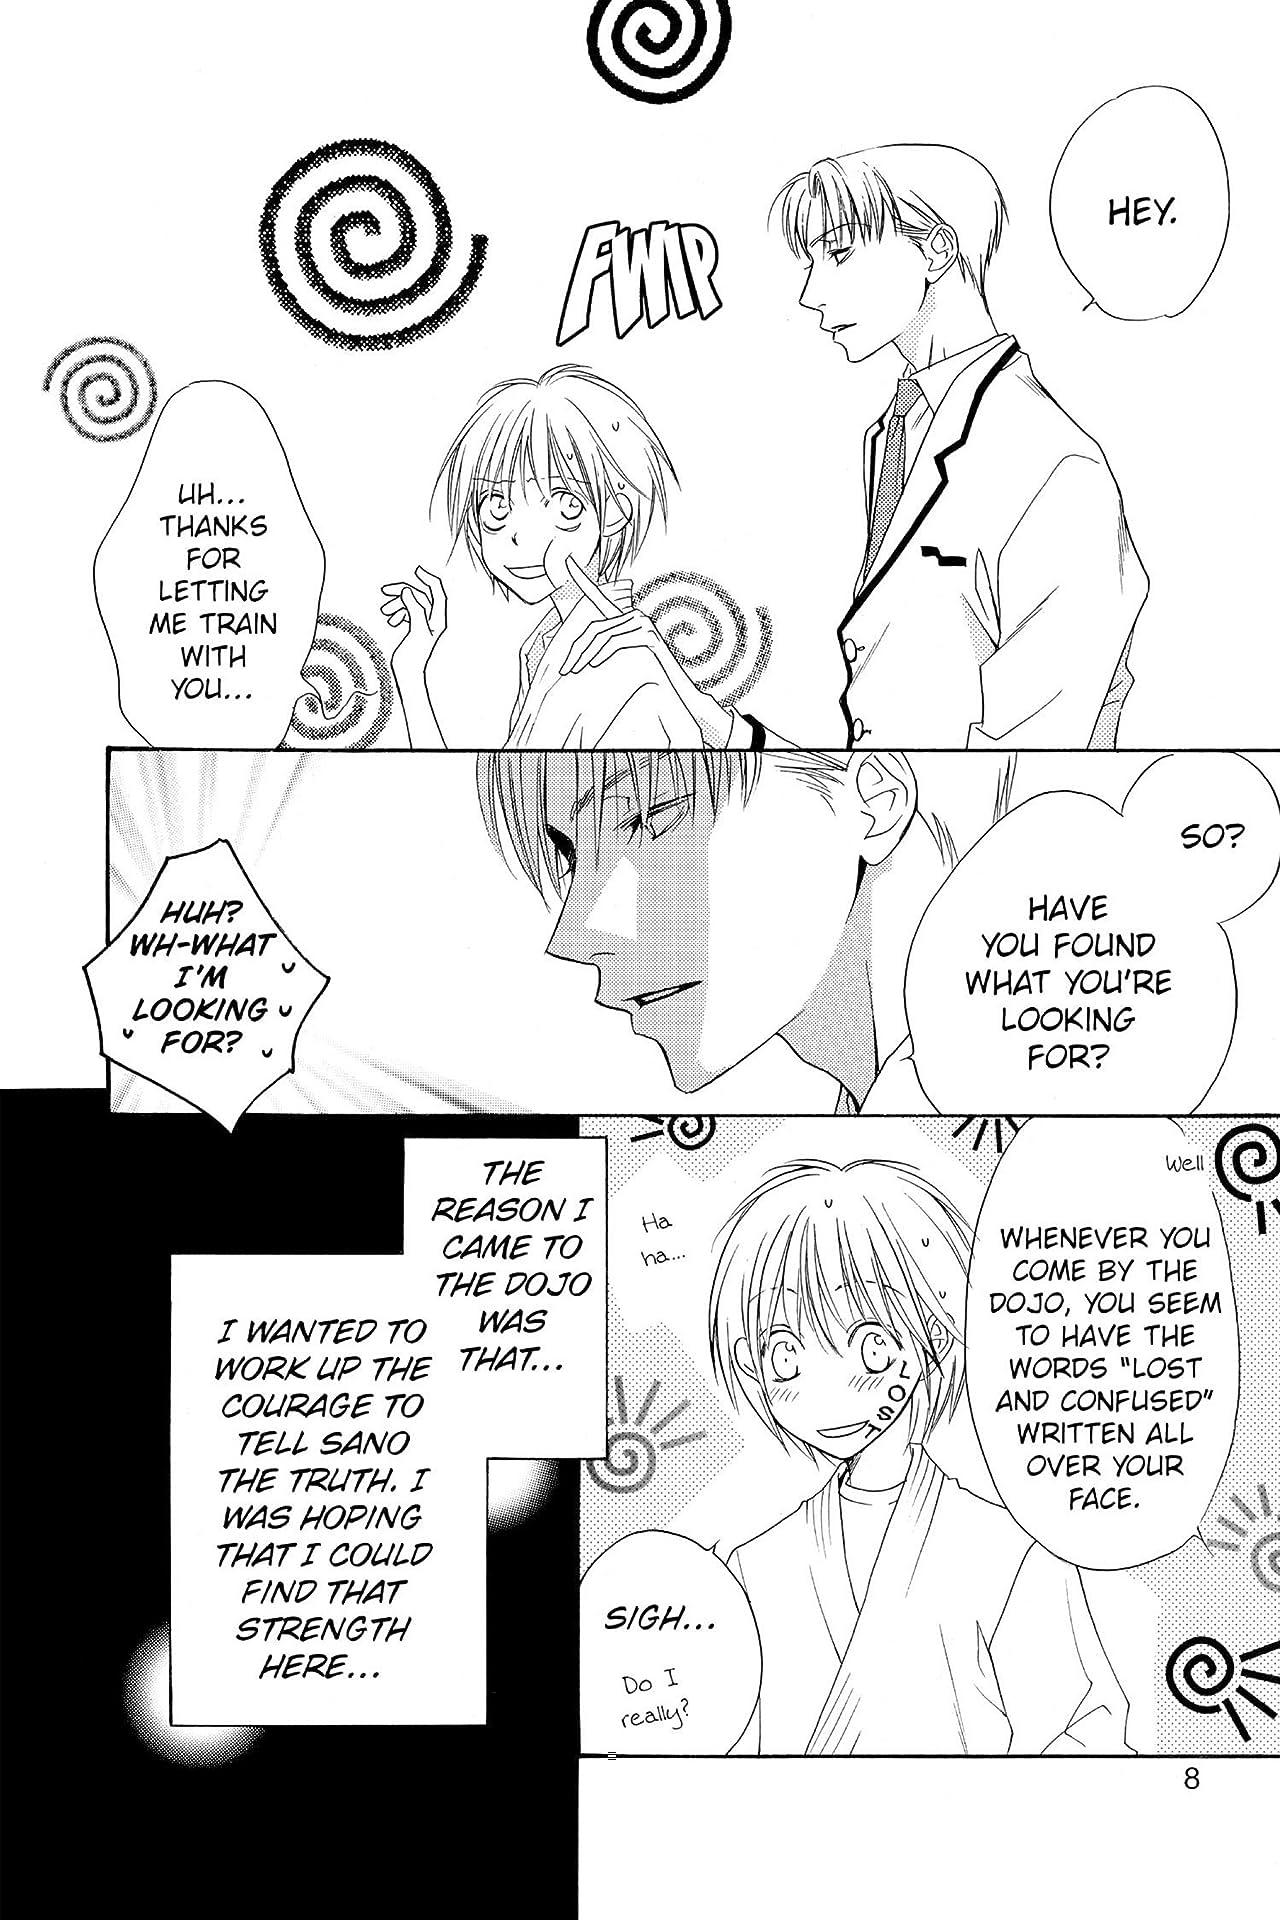 Hana-Kimi Vol. 22